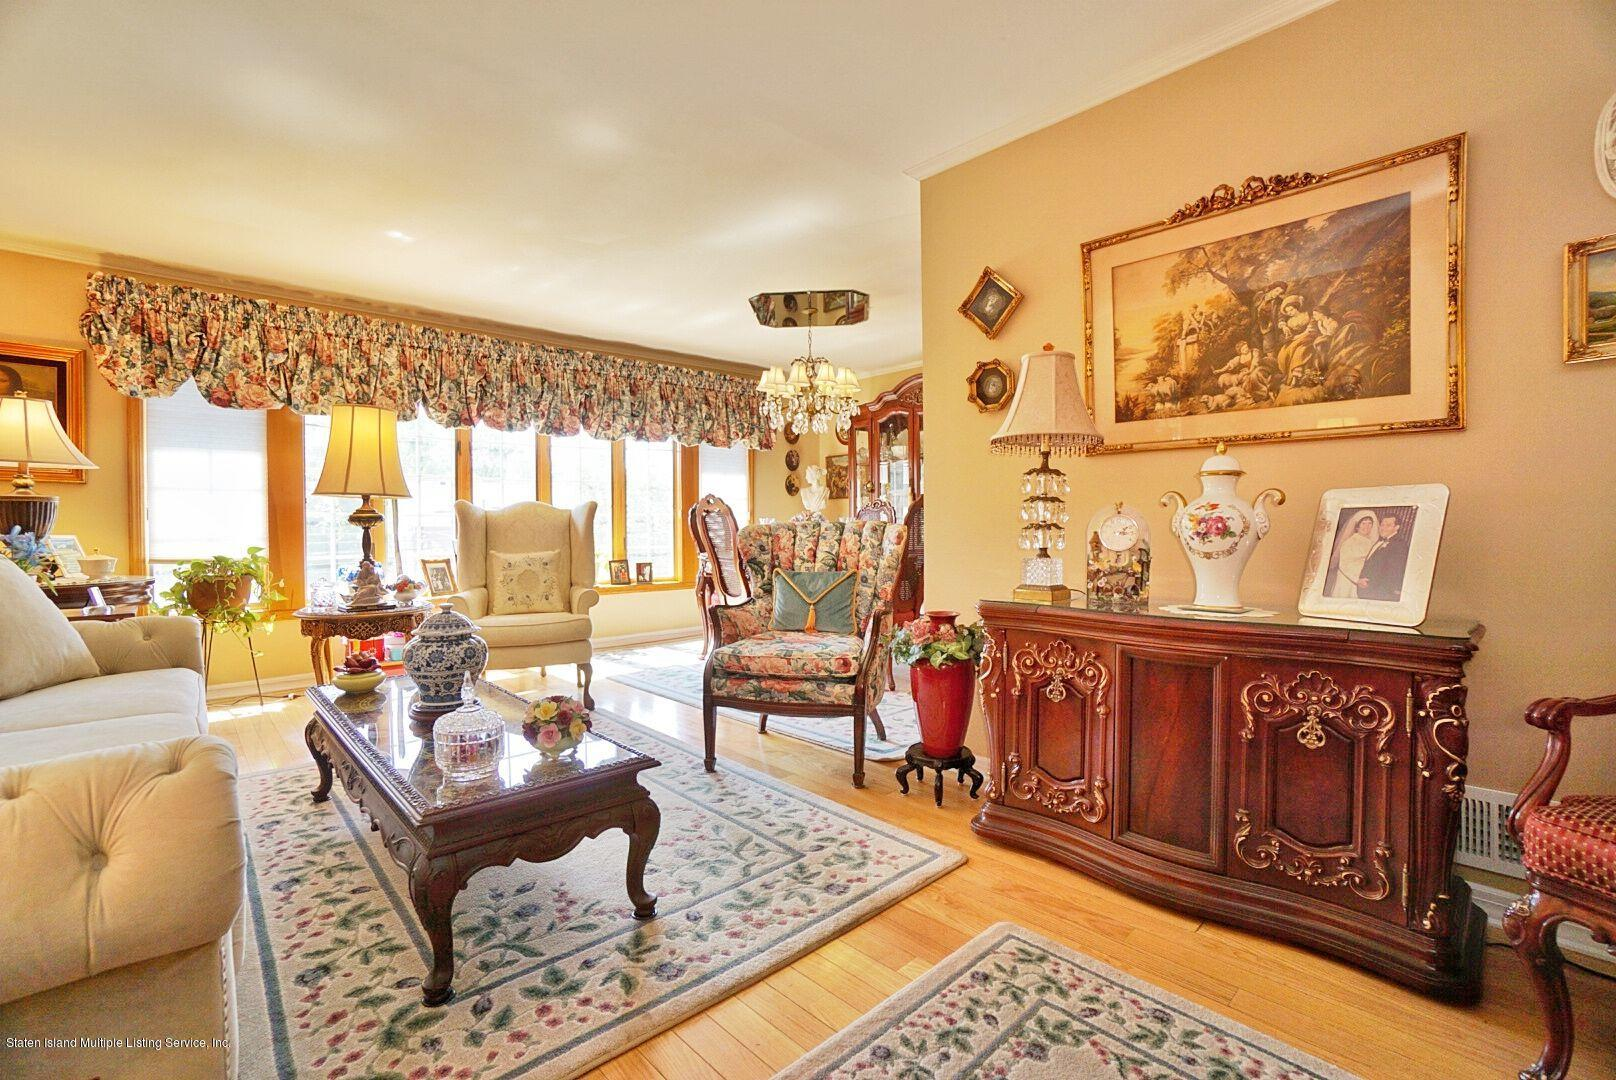 Single Family - Detached 283 Holdridge Avenue  Staten Island, NY 10312, MLS-1130000-5